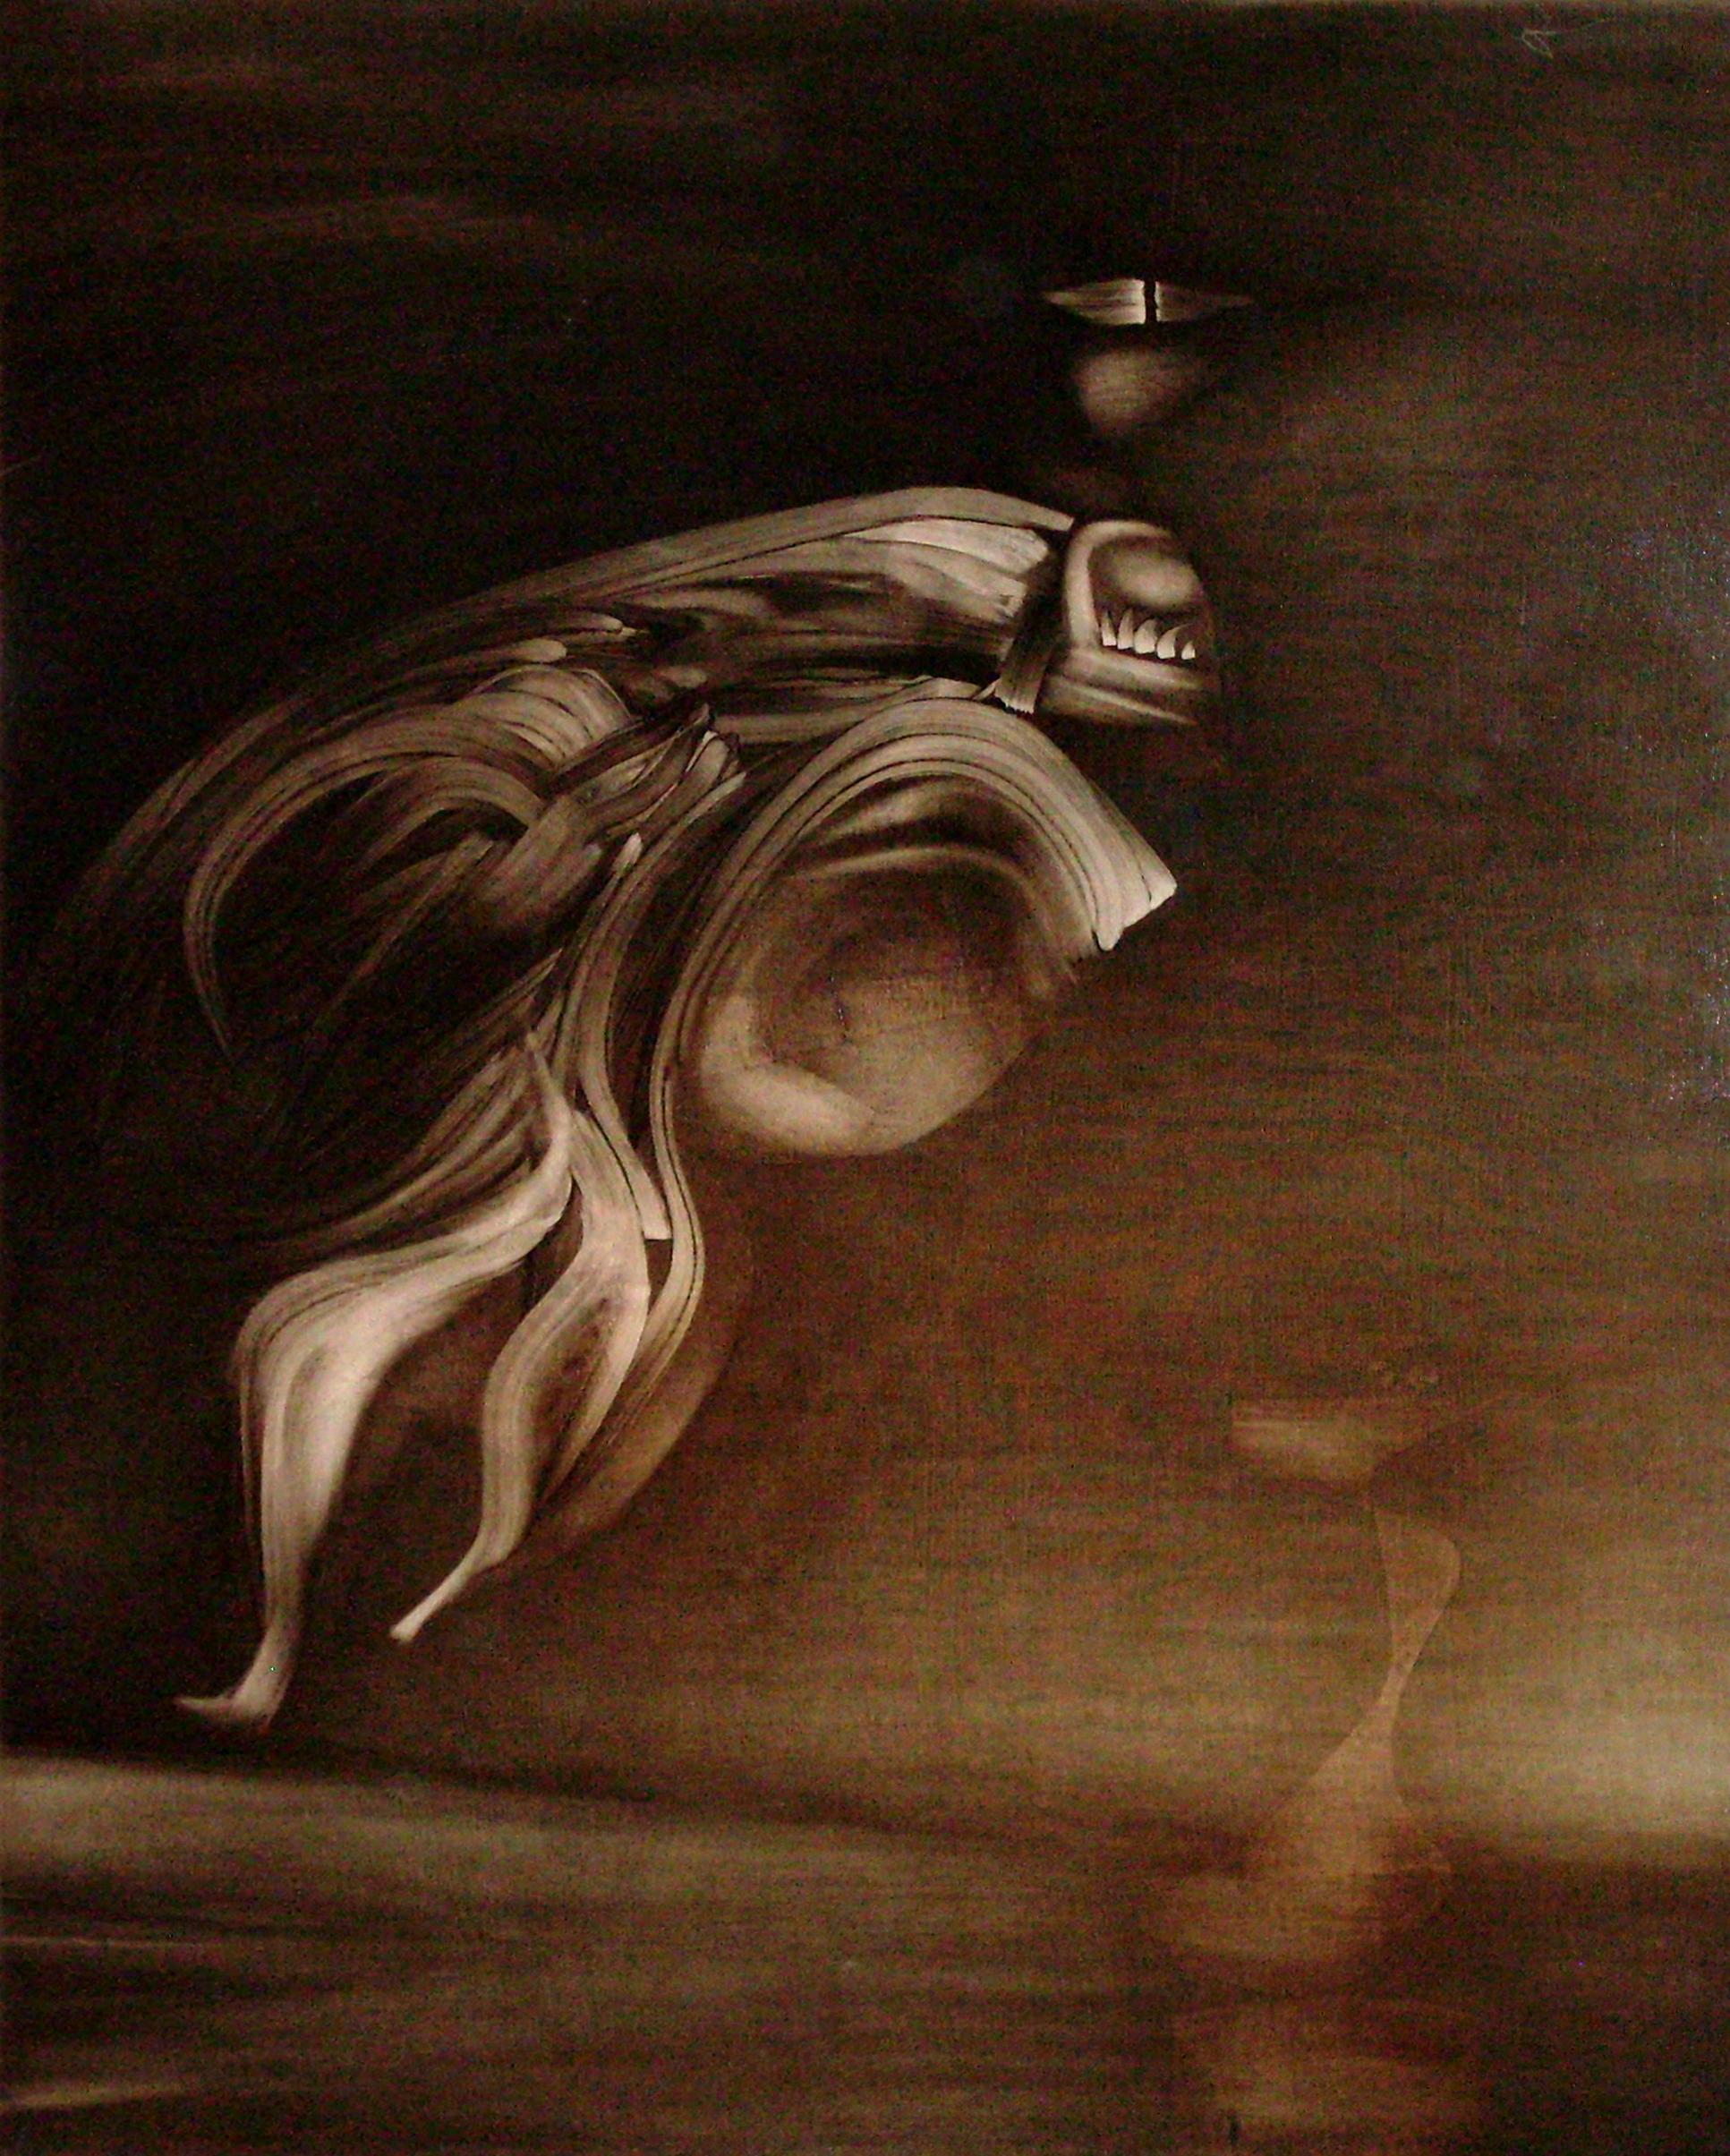 "<strong>""Sin título"" (1968)</strong><br>Collage y óleo s/tela 162 x 130 cm"